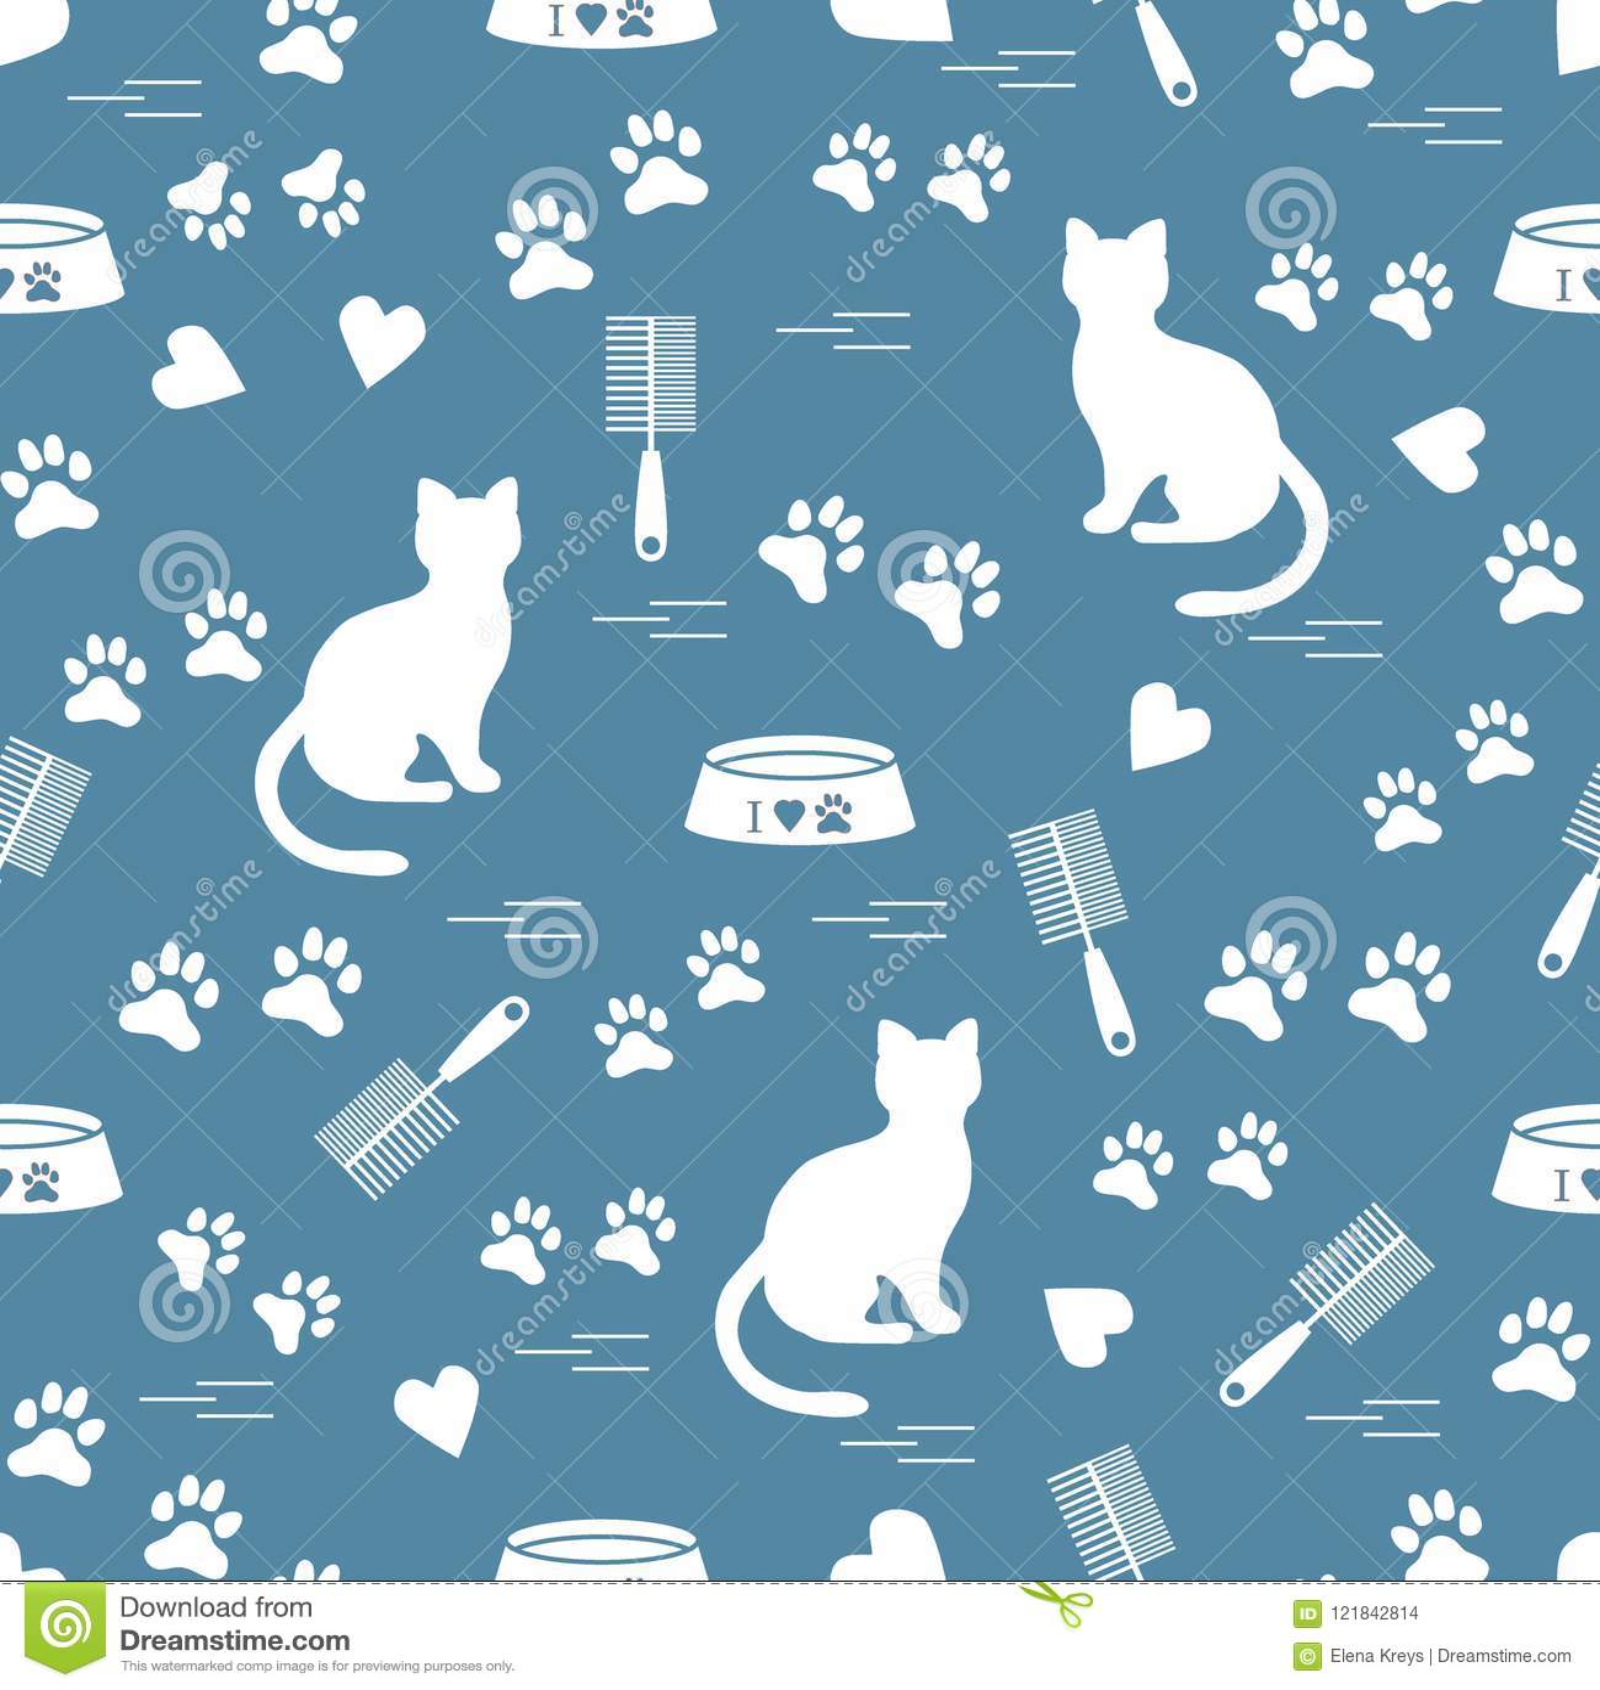 Ładny wzór sylwetka siedzący kot, ślada, serca, puchar i